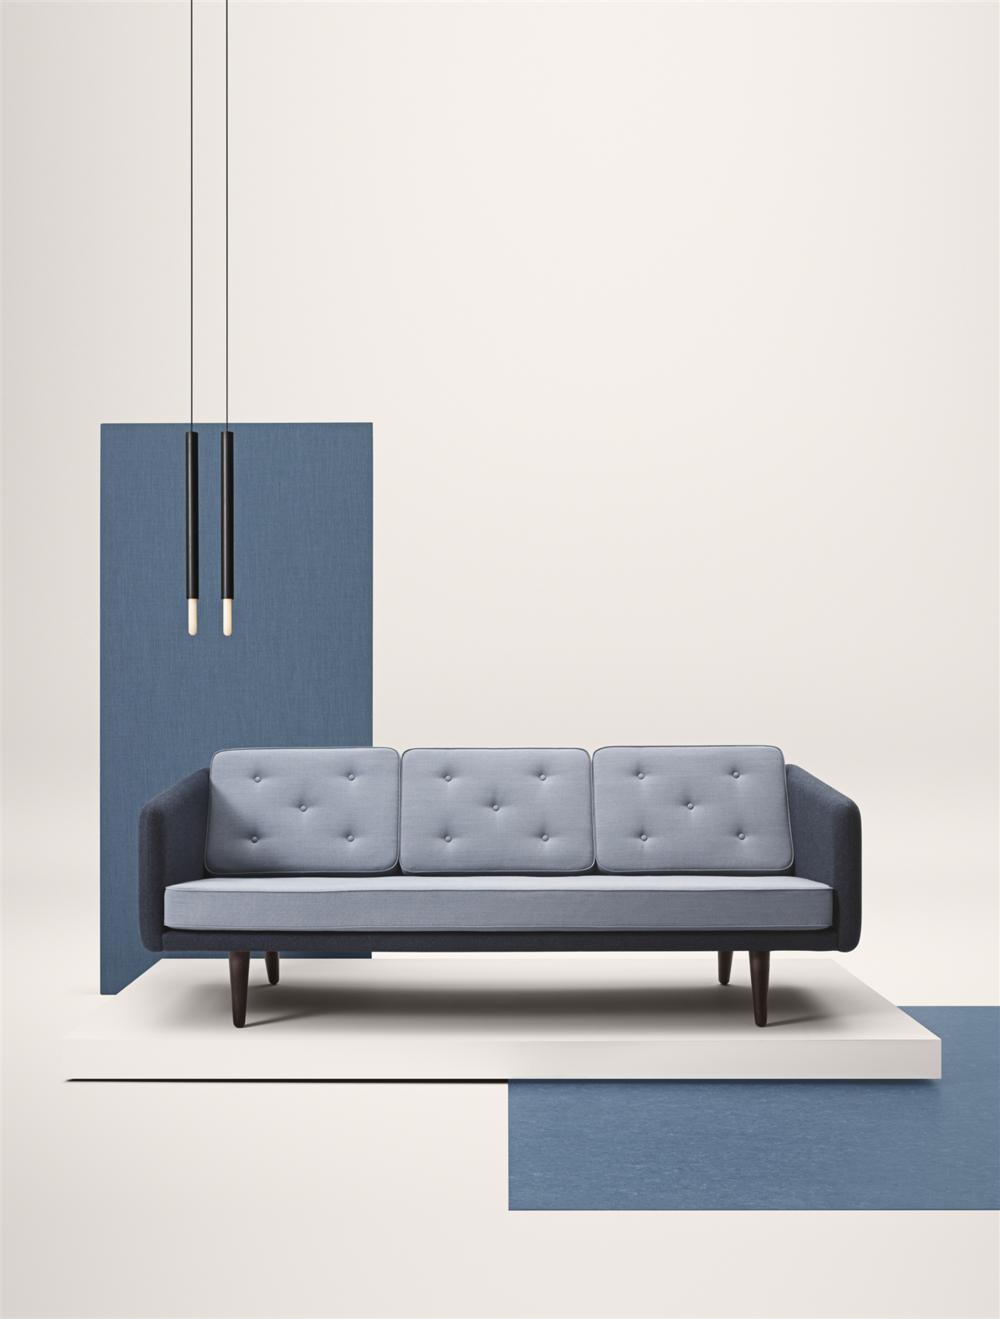 Fredericia No 1 Sofa - 3 seat